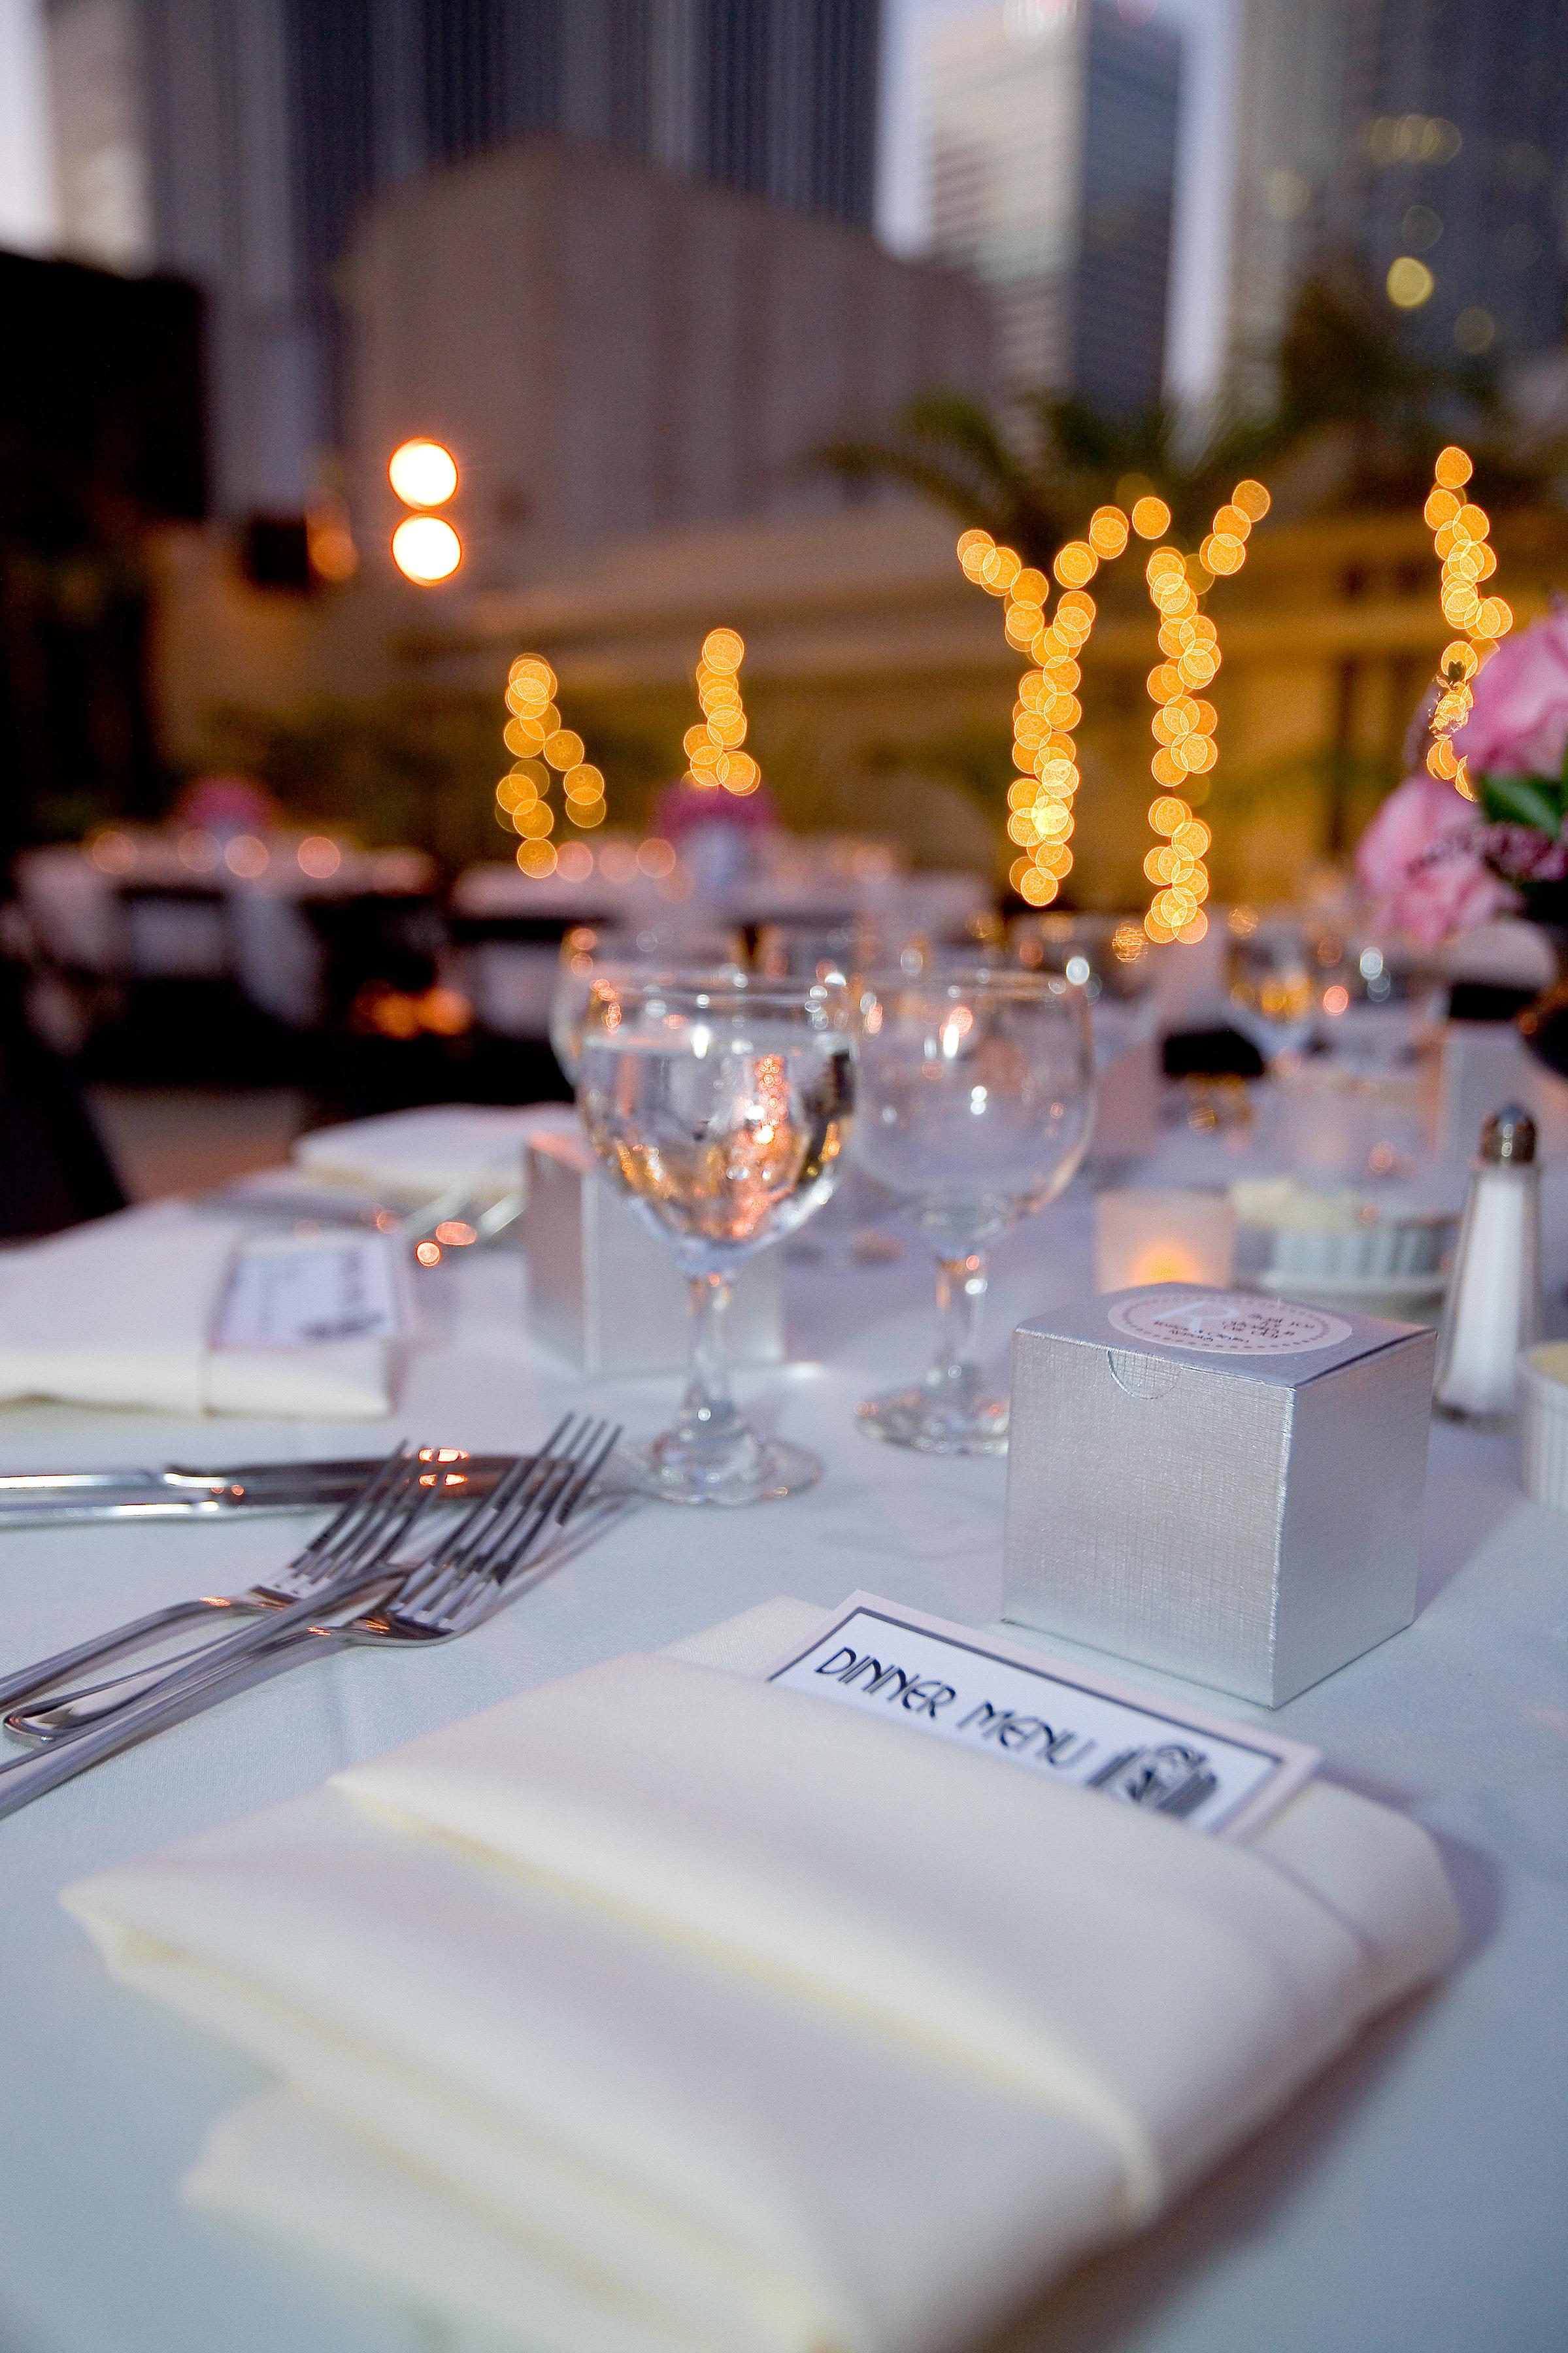 DIY, Reception, Flowers & Decor, Centerpieces, Centerpiece, Menu, Tabletop, Tealight weddings events